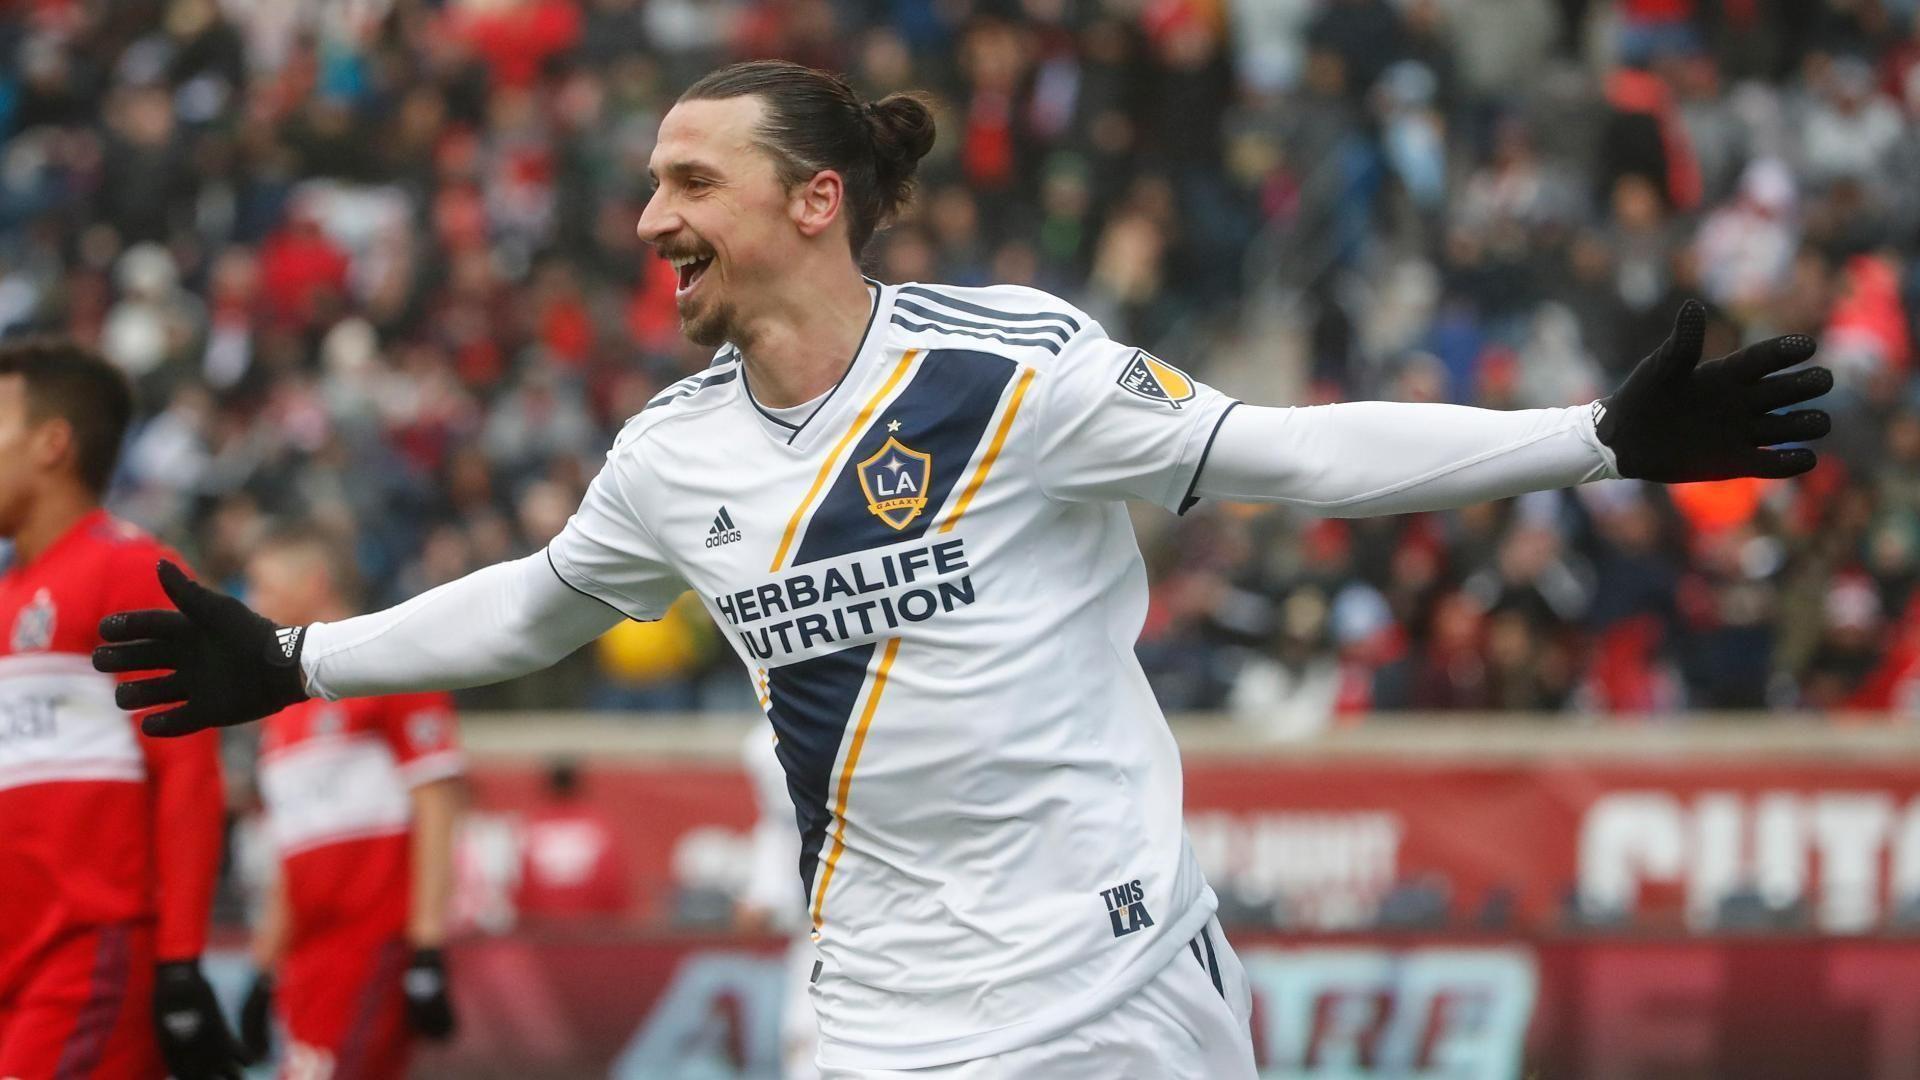 Chicago 0-1 LA Galaxy: Zlatan scores the winner - Via MLS